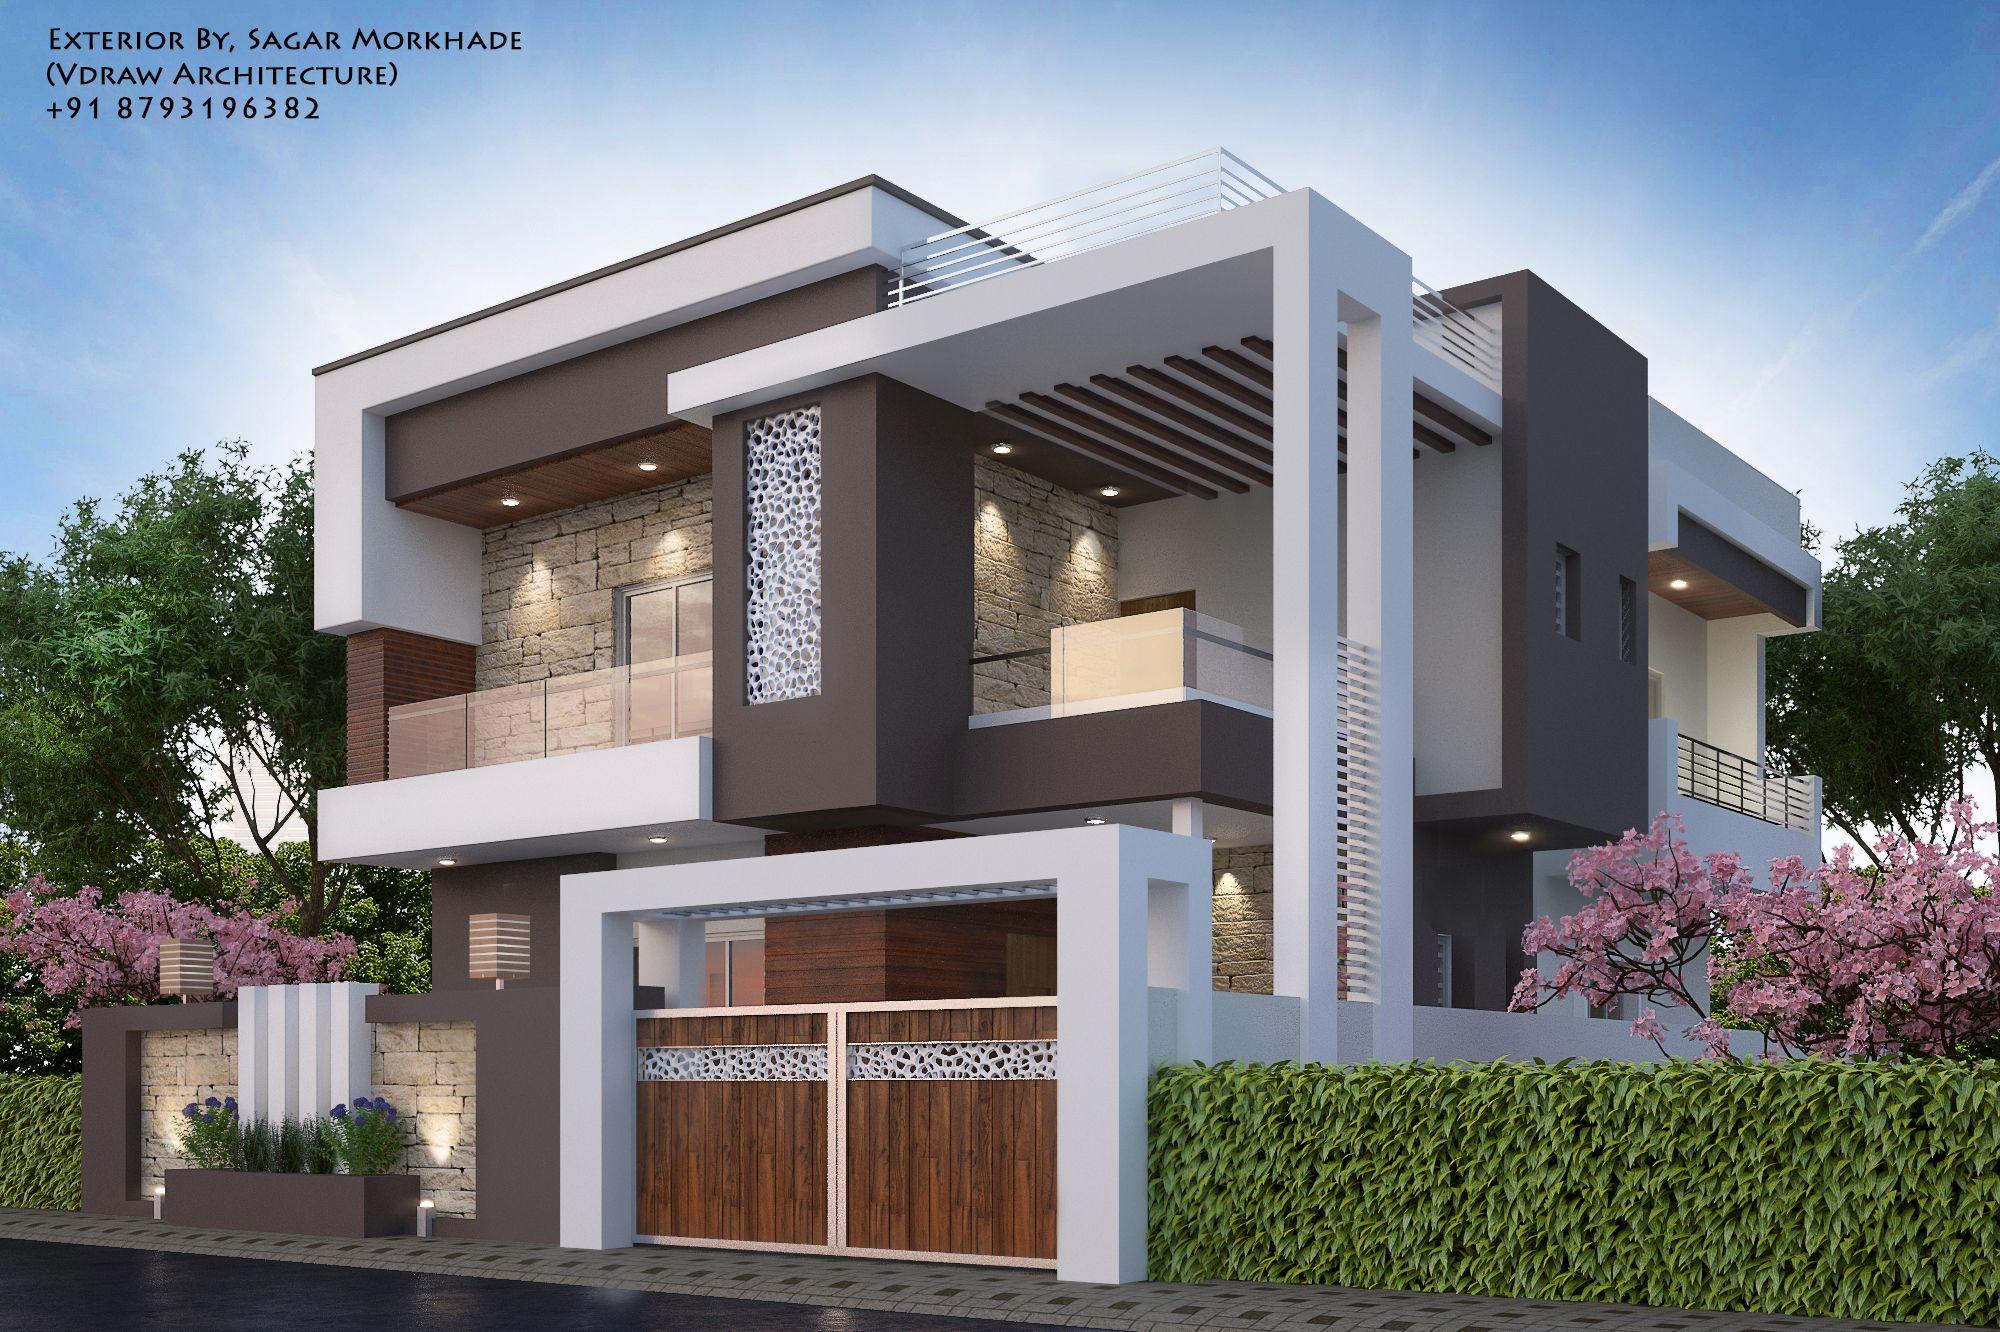 Modern House Exterior By Sagar Morkhade Vdraw Architecture 91